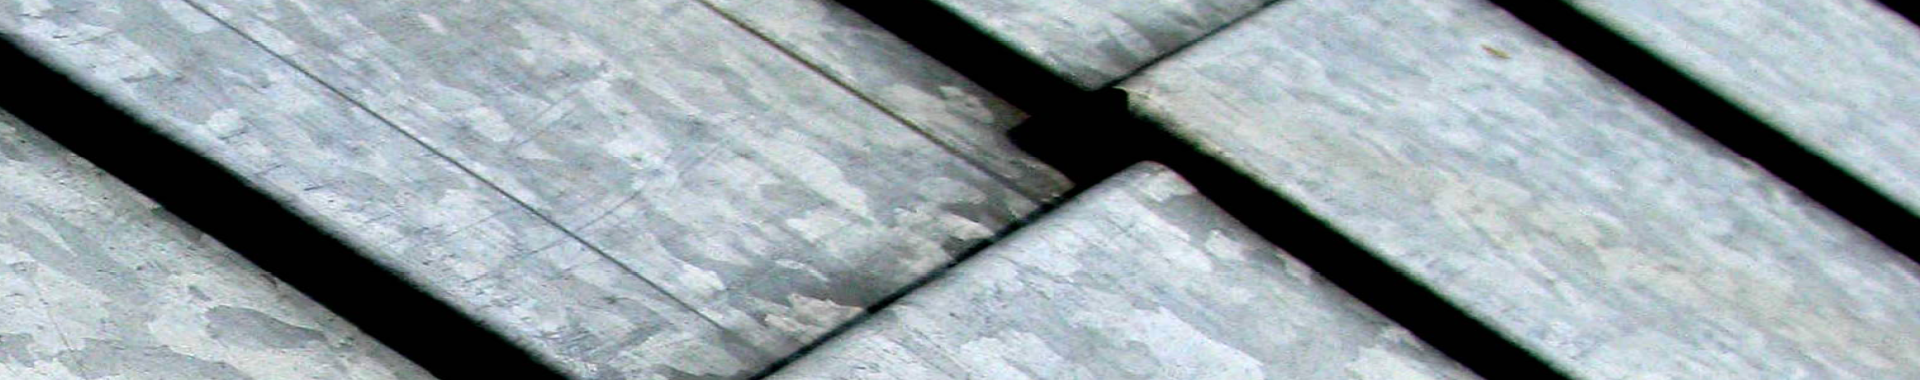 tiles-metal/miuenski-miuenski